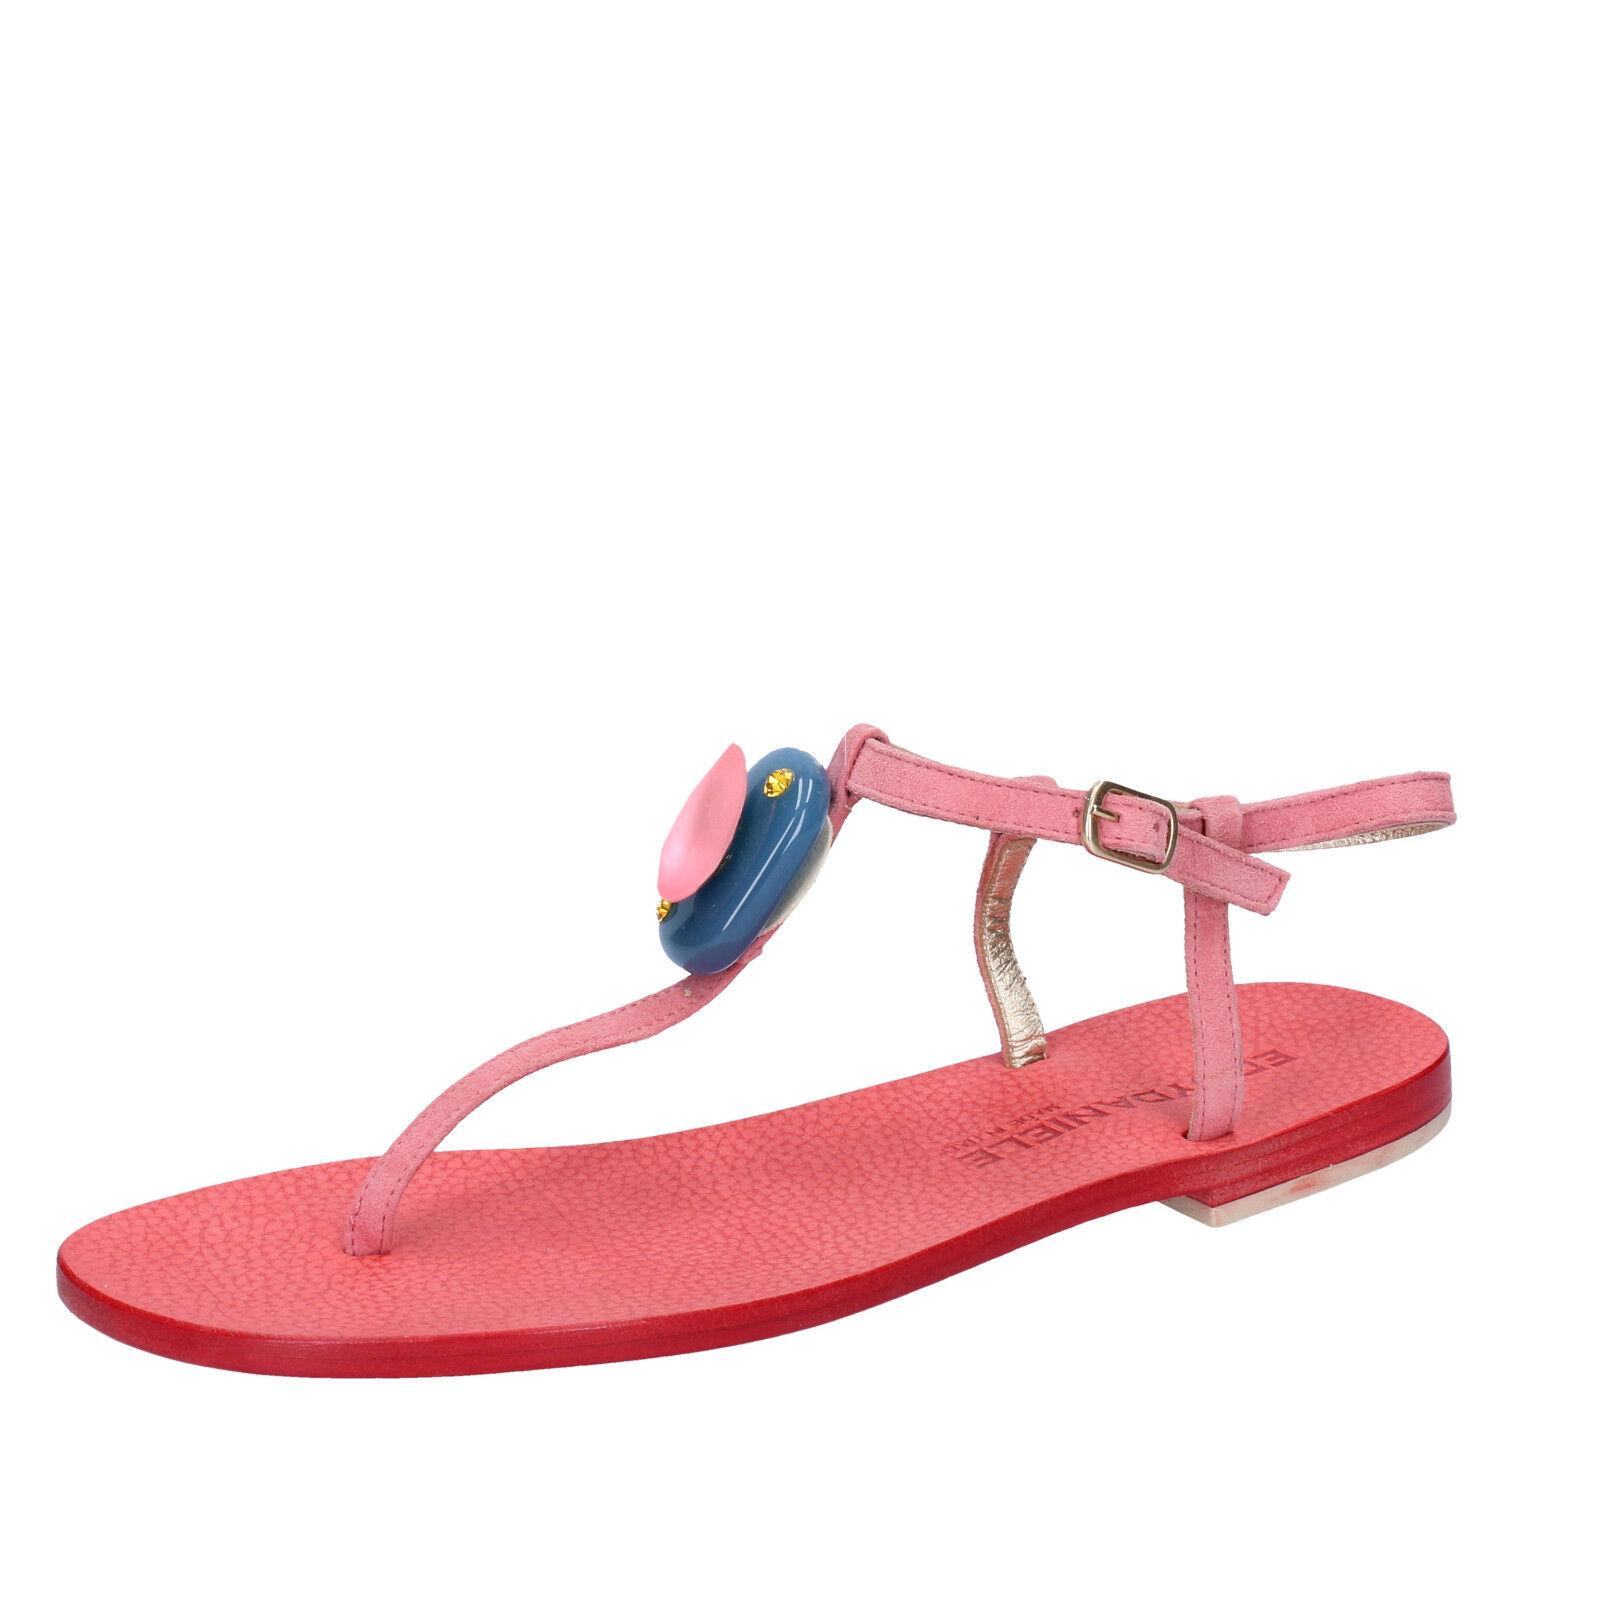 scarpe sandali donna EDDY DANIELE 37 EU sandali scarpe rosa camoscio swarovski AX988 bf19c3